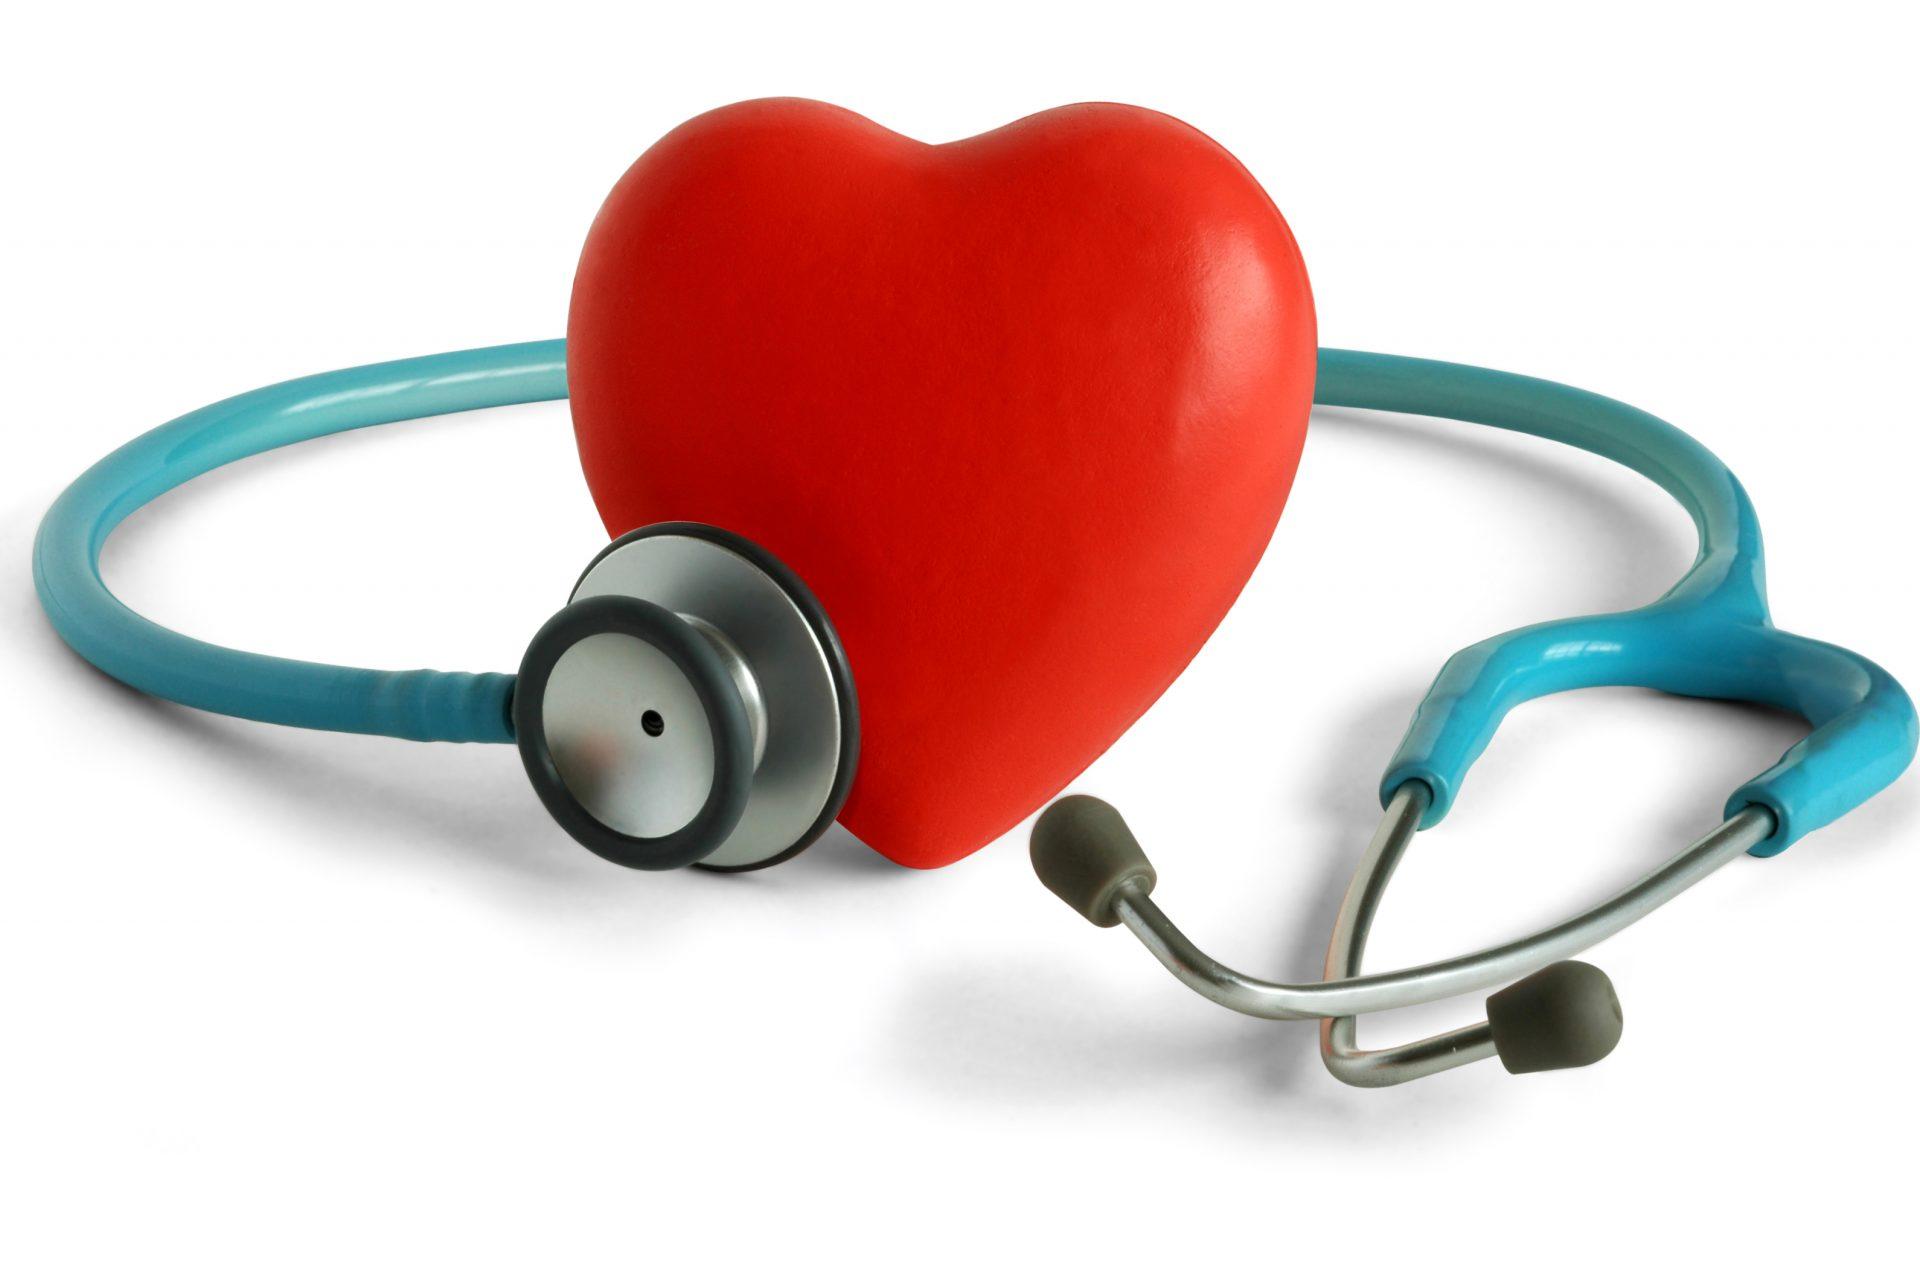 muzikos gydymas hipertenzija